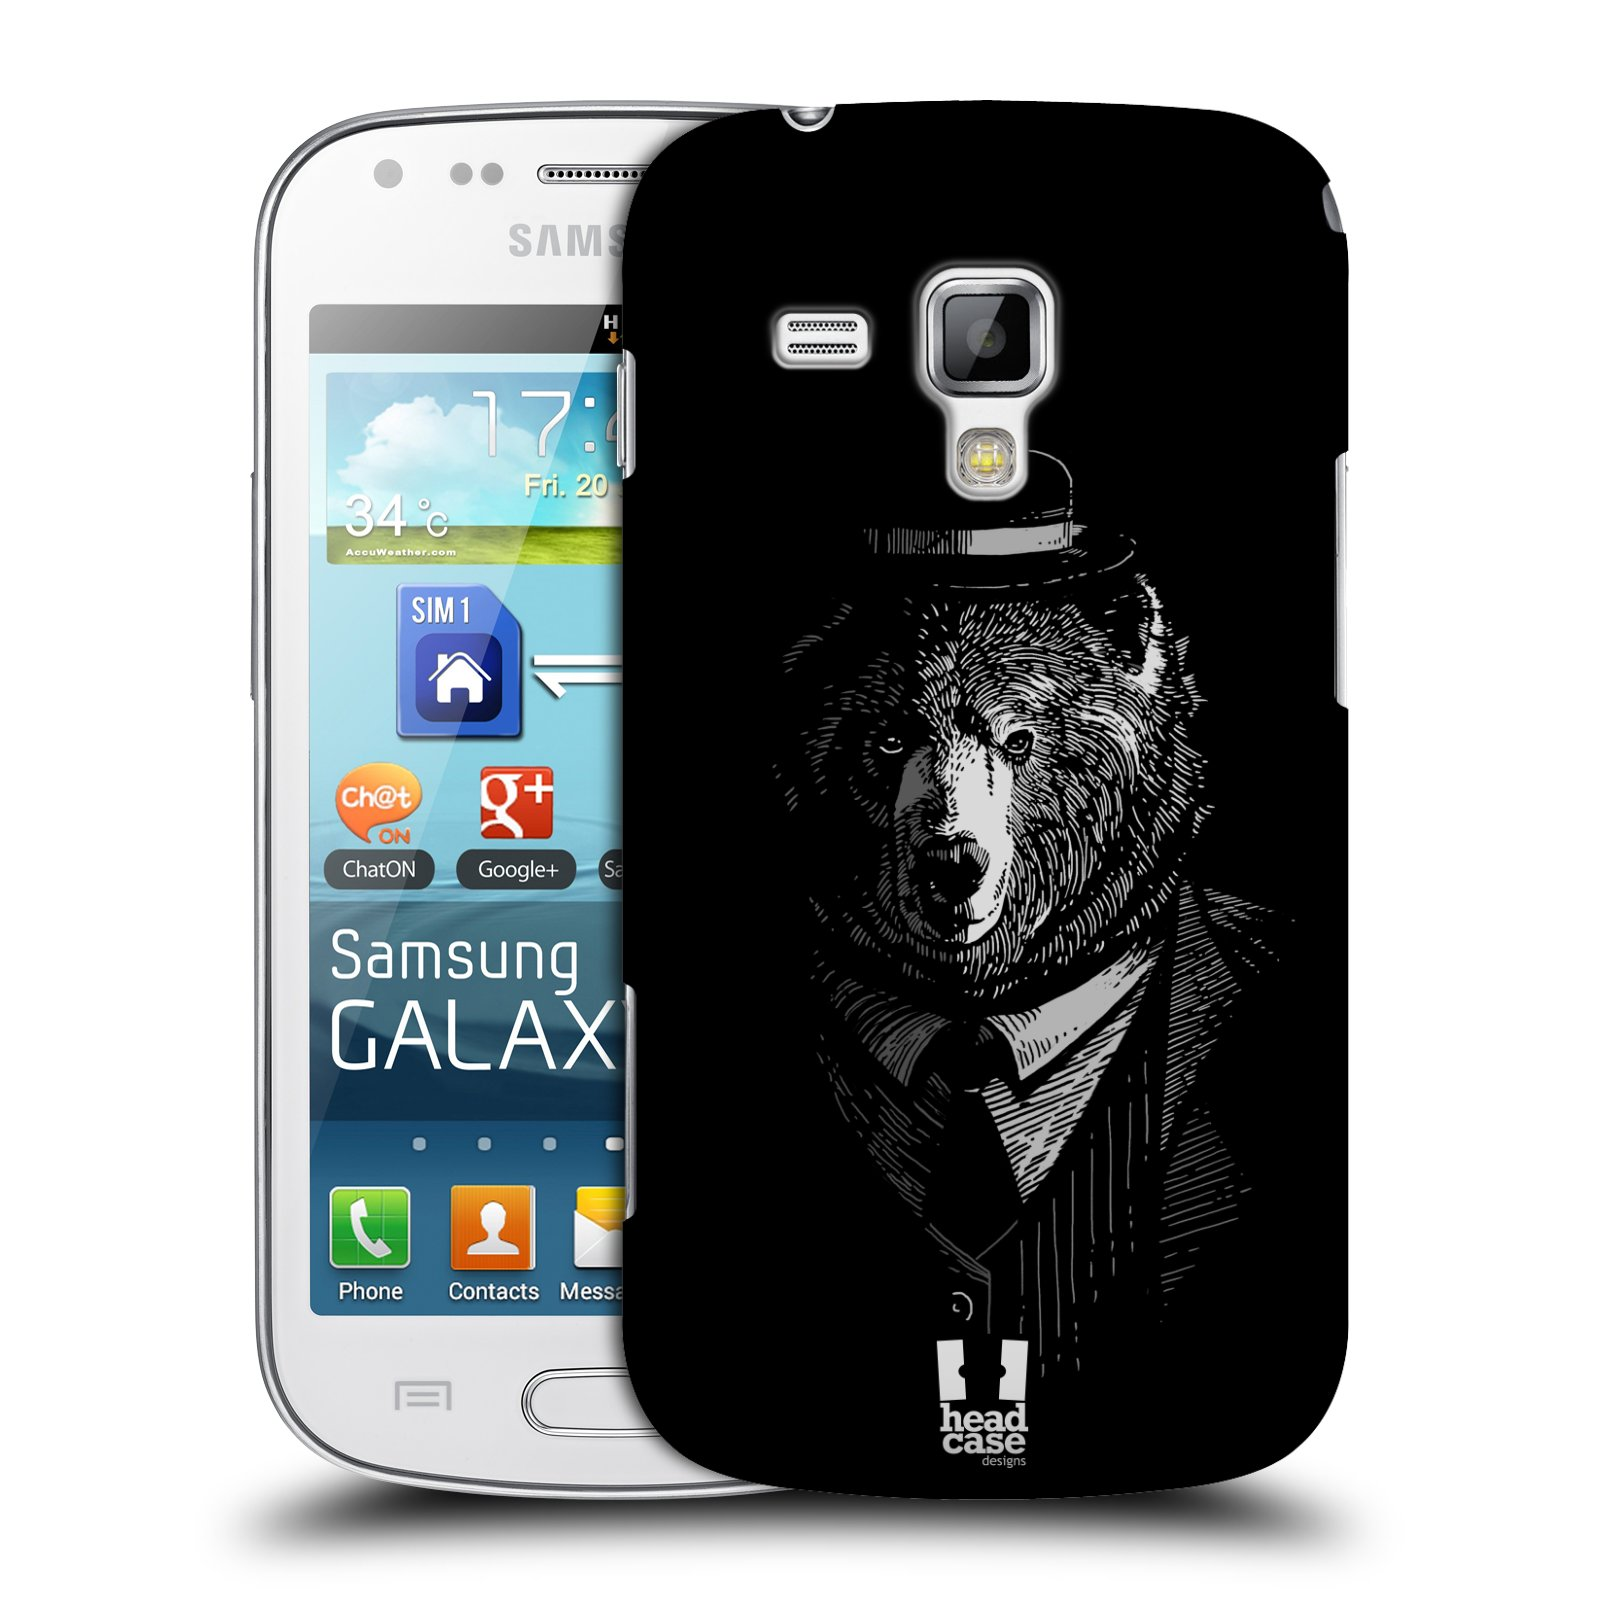 Plastové pouzdro na mobil Samsung Galaxy Trend HEAD CASE MEDVĚD V KVÁDRU (Kryt či obal na mobilní telefon Samsung Galaxy Trend GT-S7560)